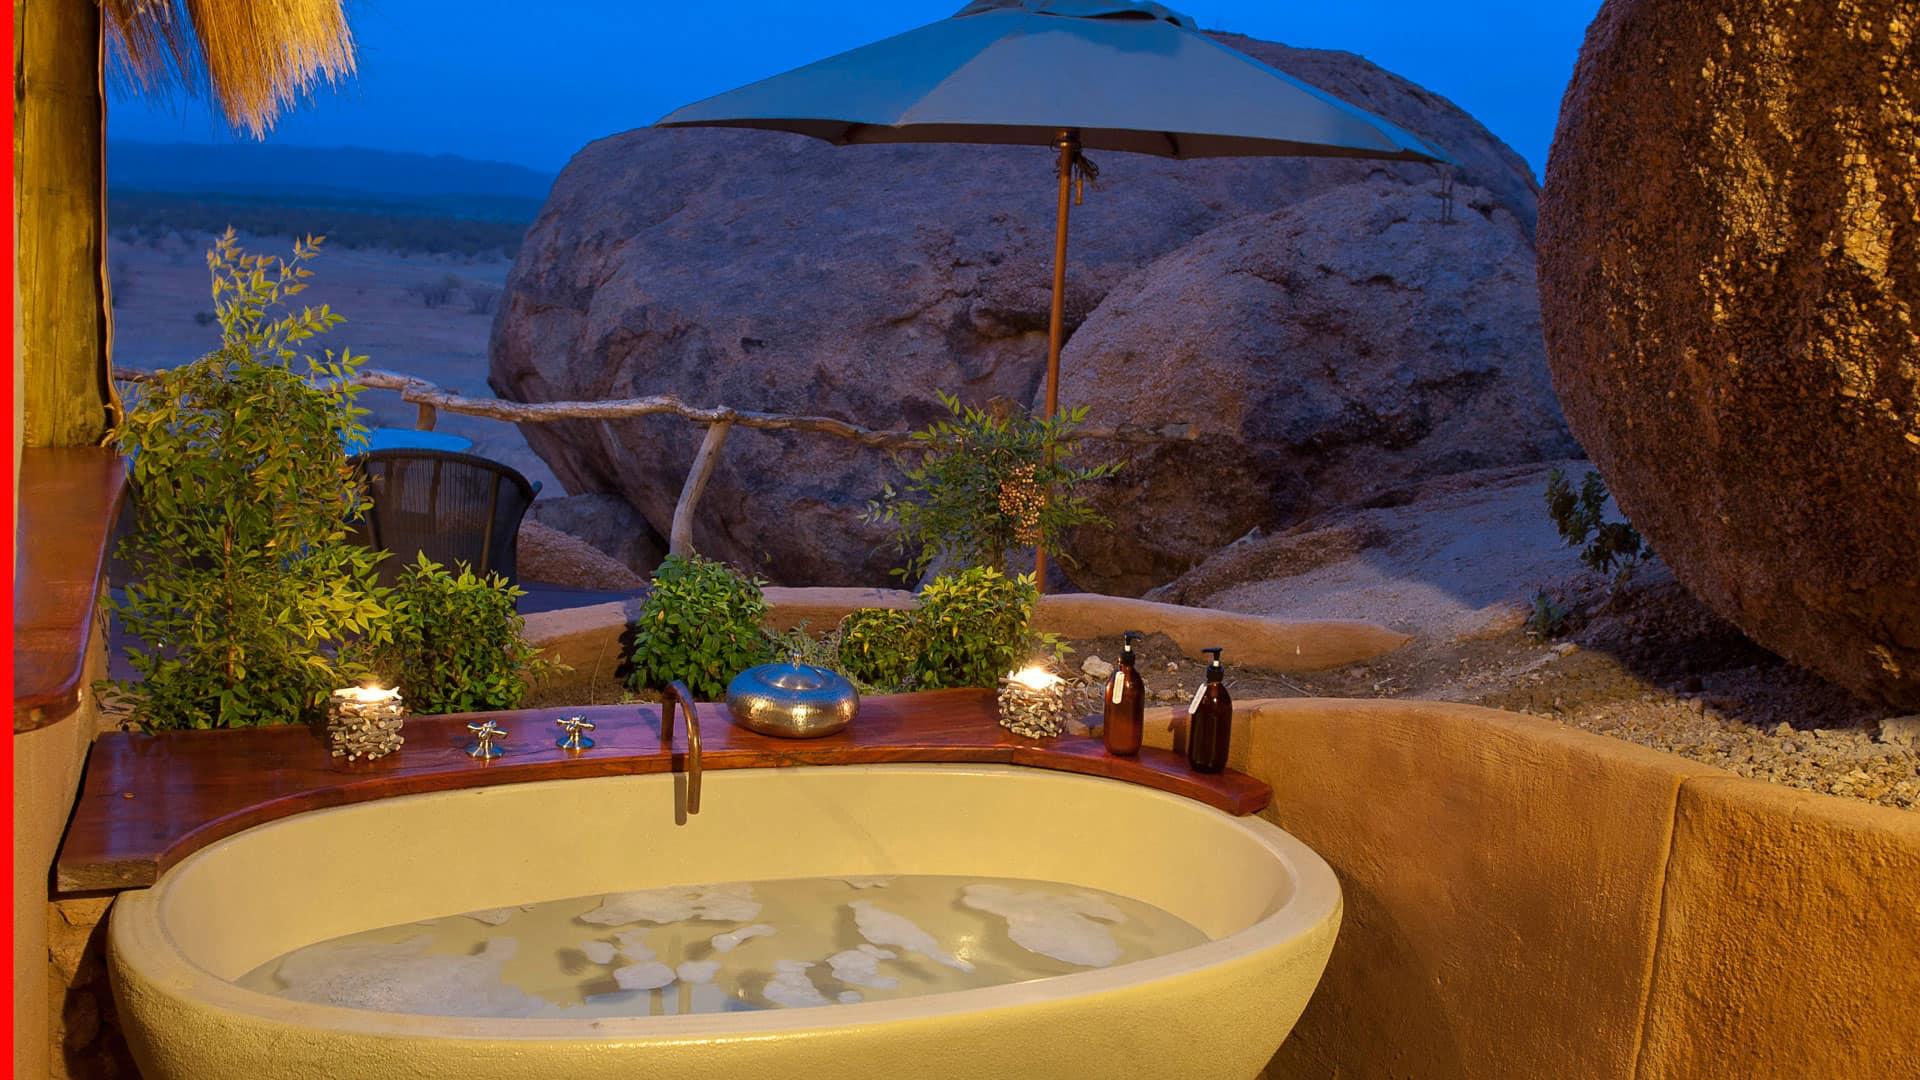 namibia-kipwe-camp-bath-night-min.jpg